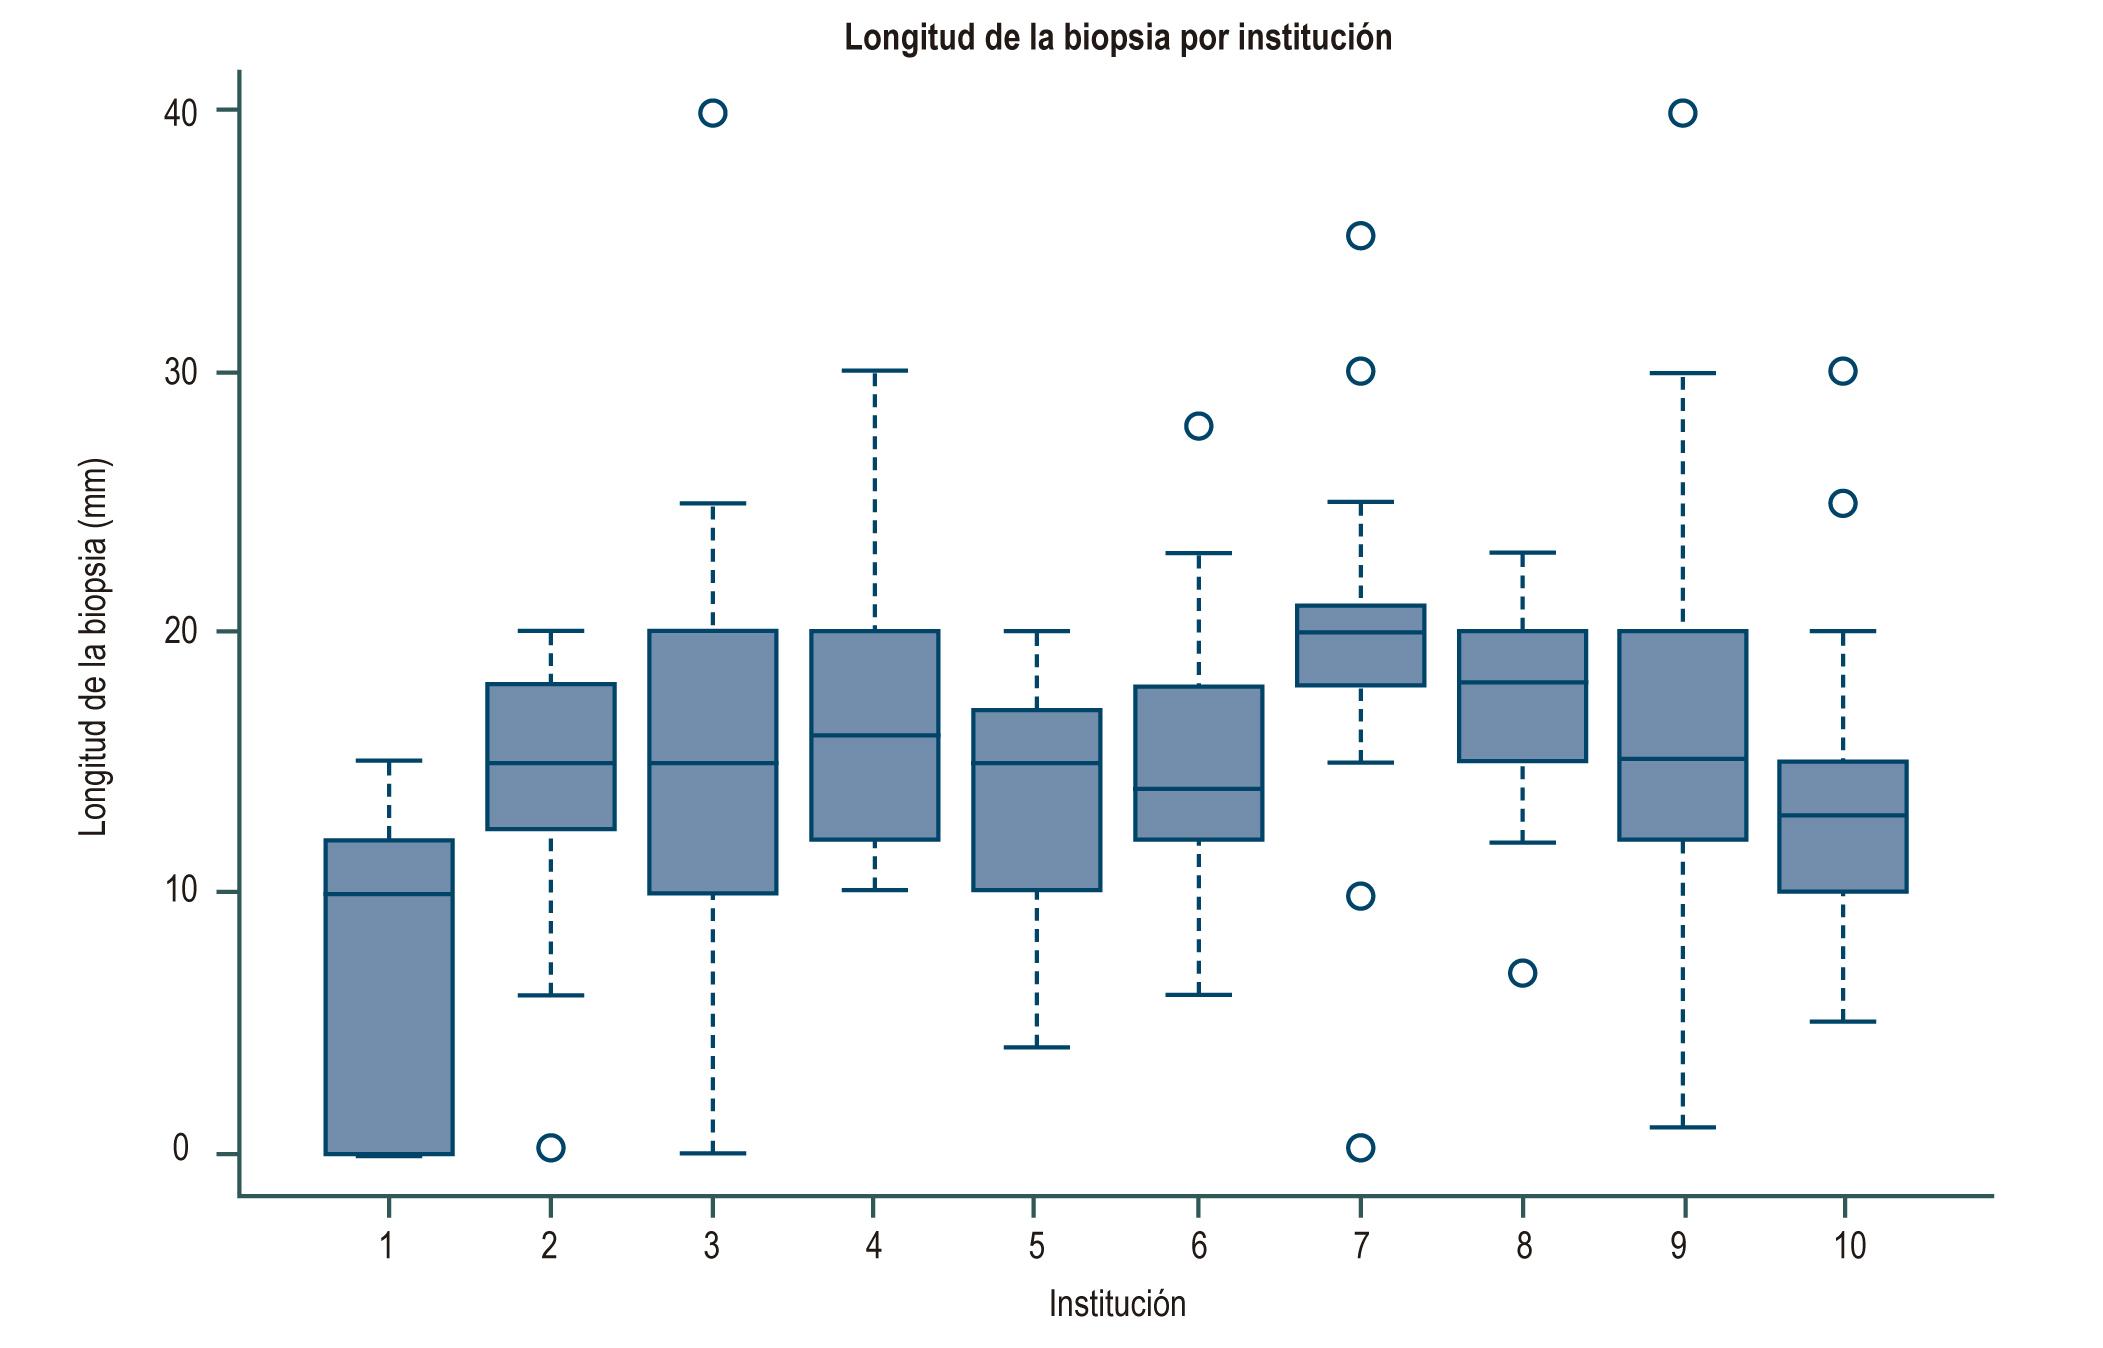 Figura 1. Longitud de la biopsia hepática por institución en mm. Kruskal-Wallis, p = 0,0001 (prueba de Kruskal-Wallis)